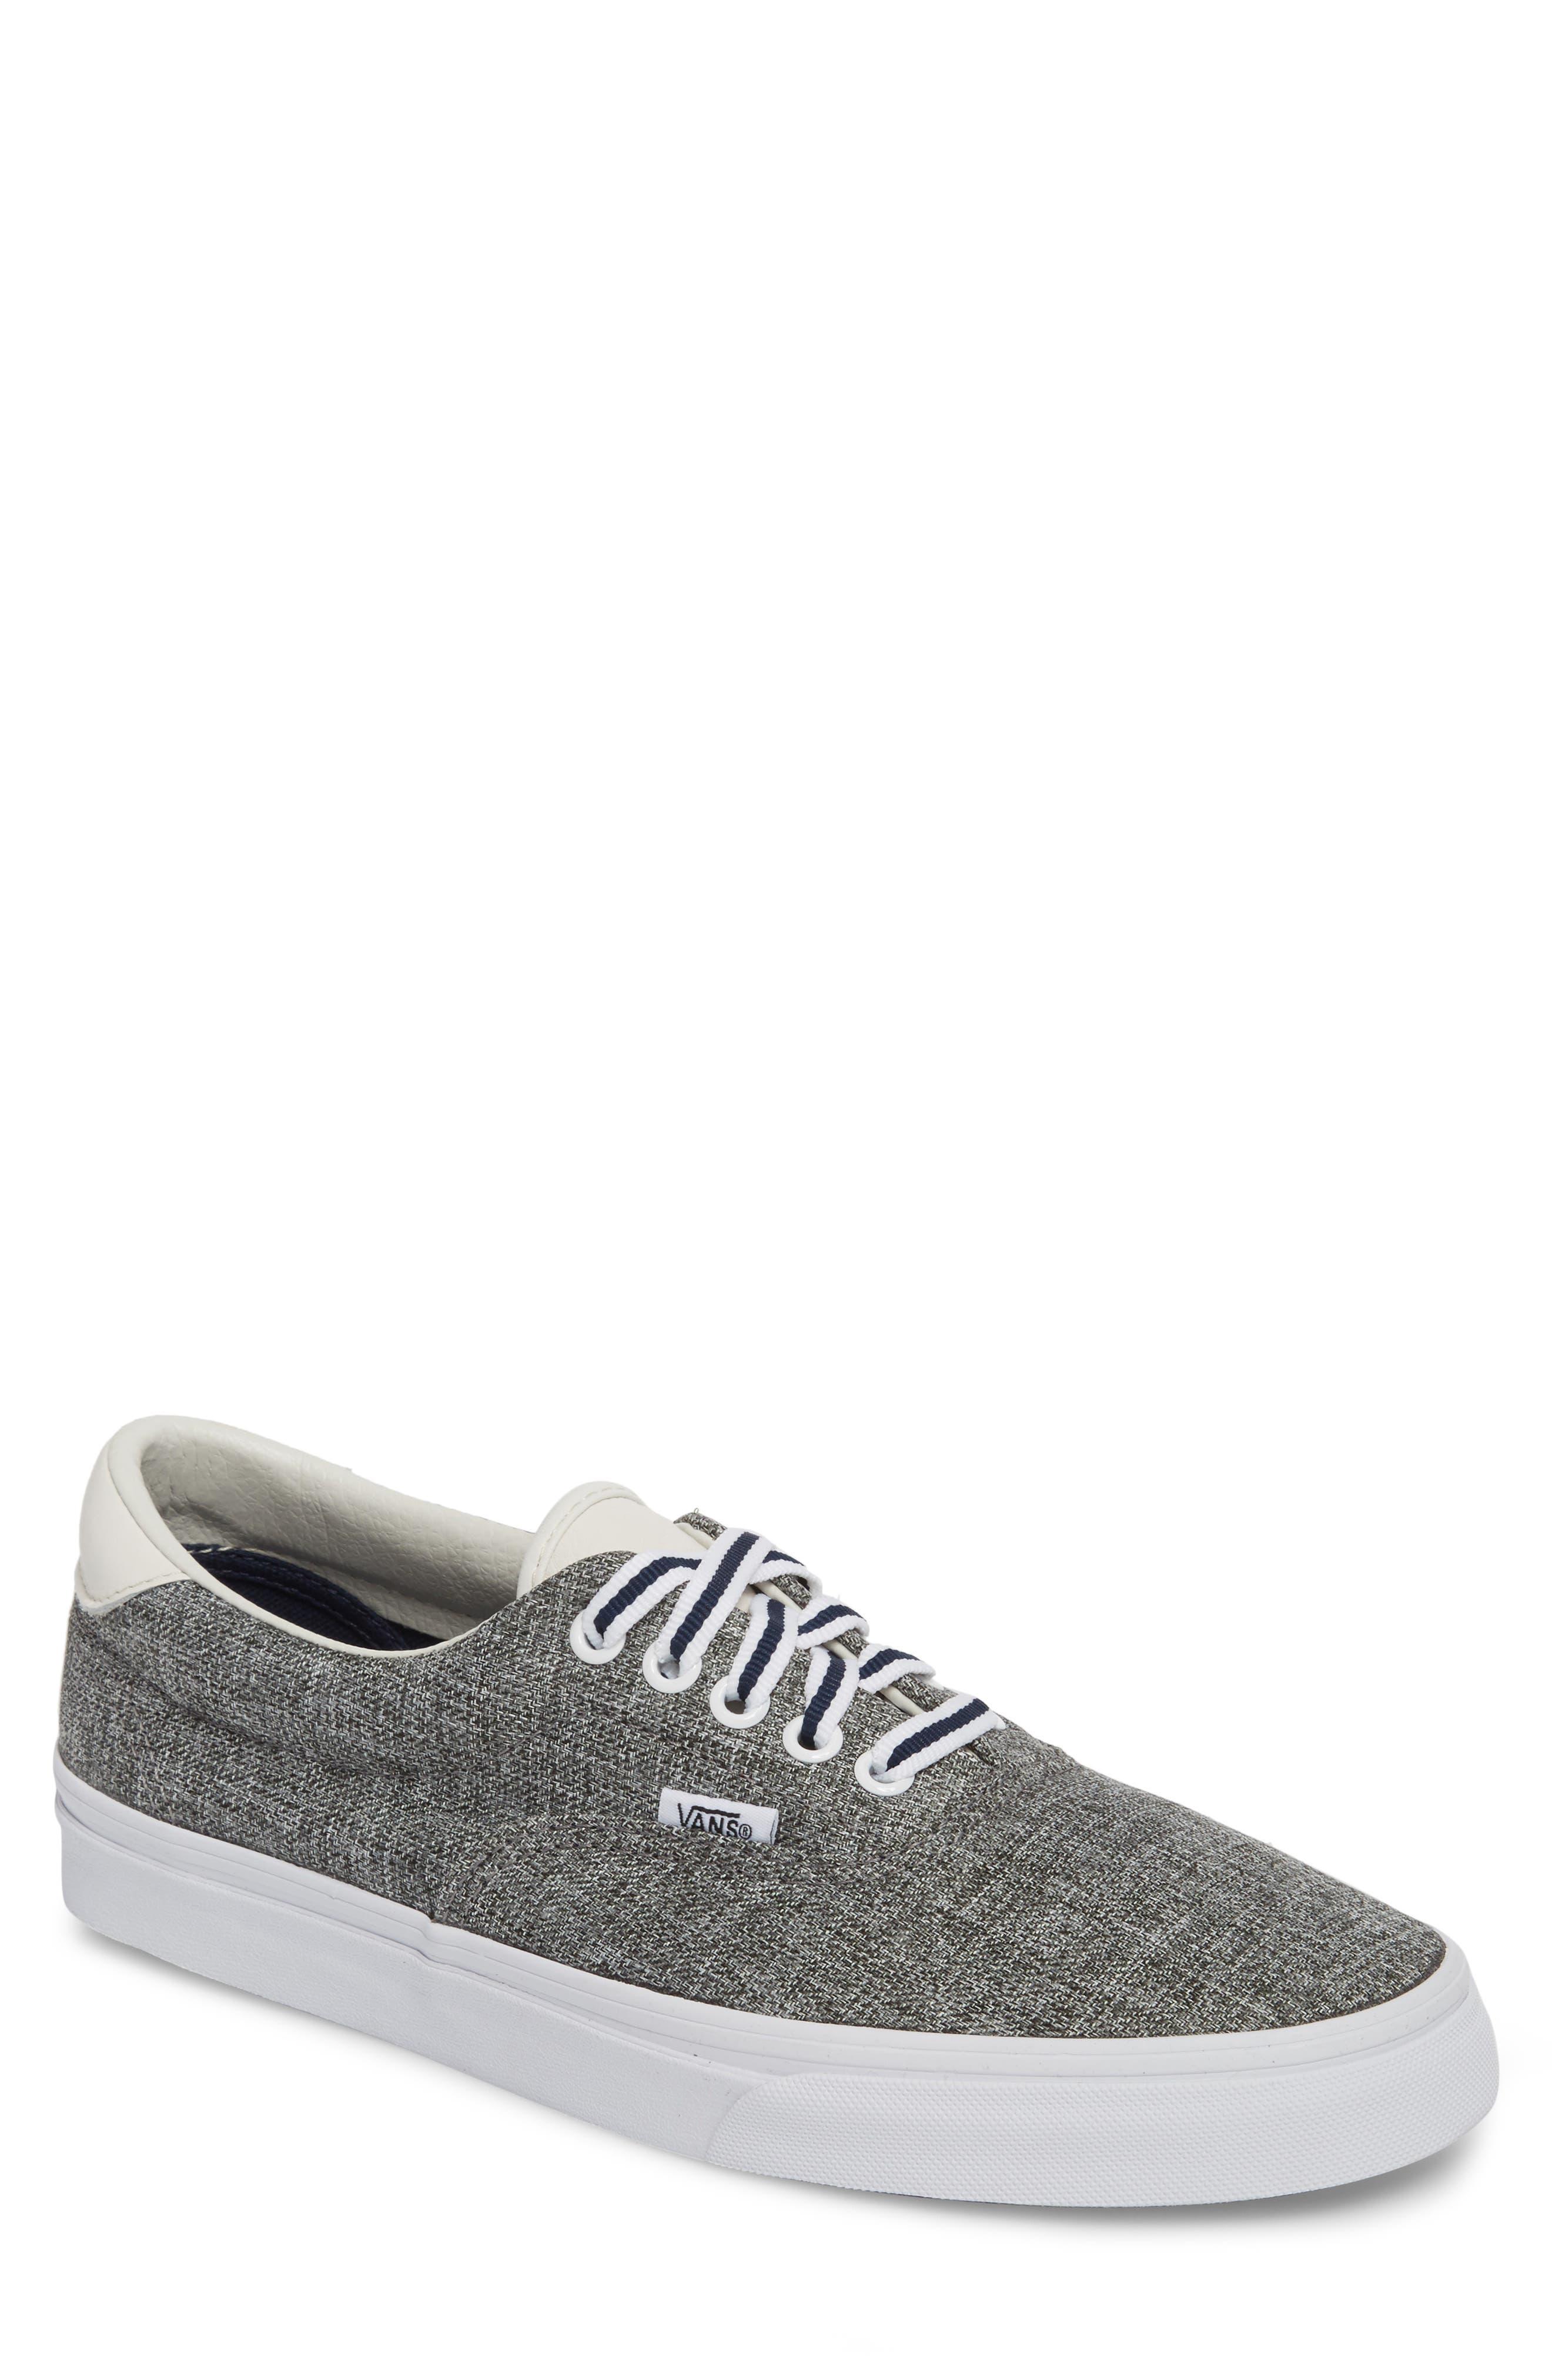 'Era 59' Sneaker,                             Main thumbnail 1, color,                             022